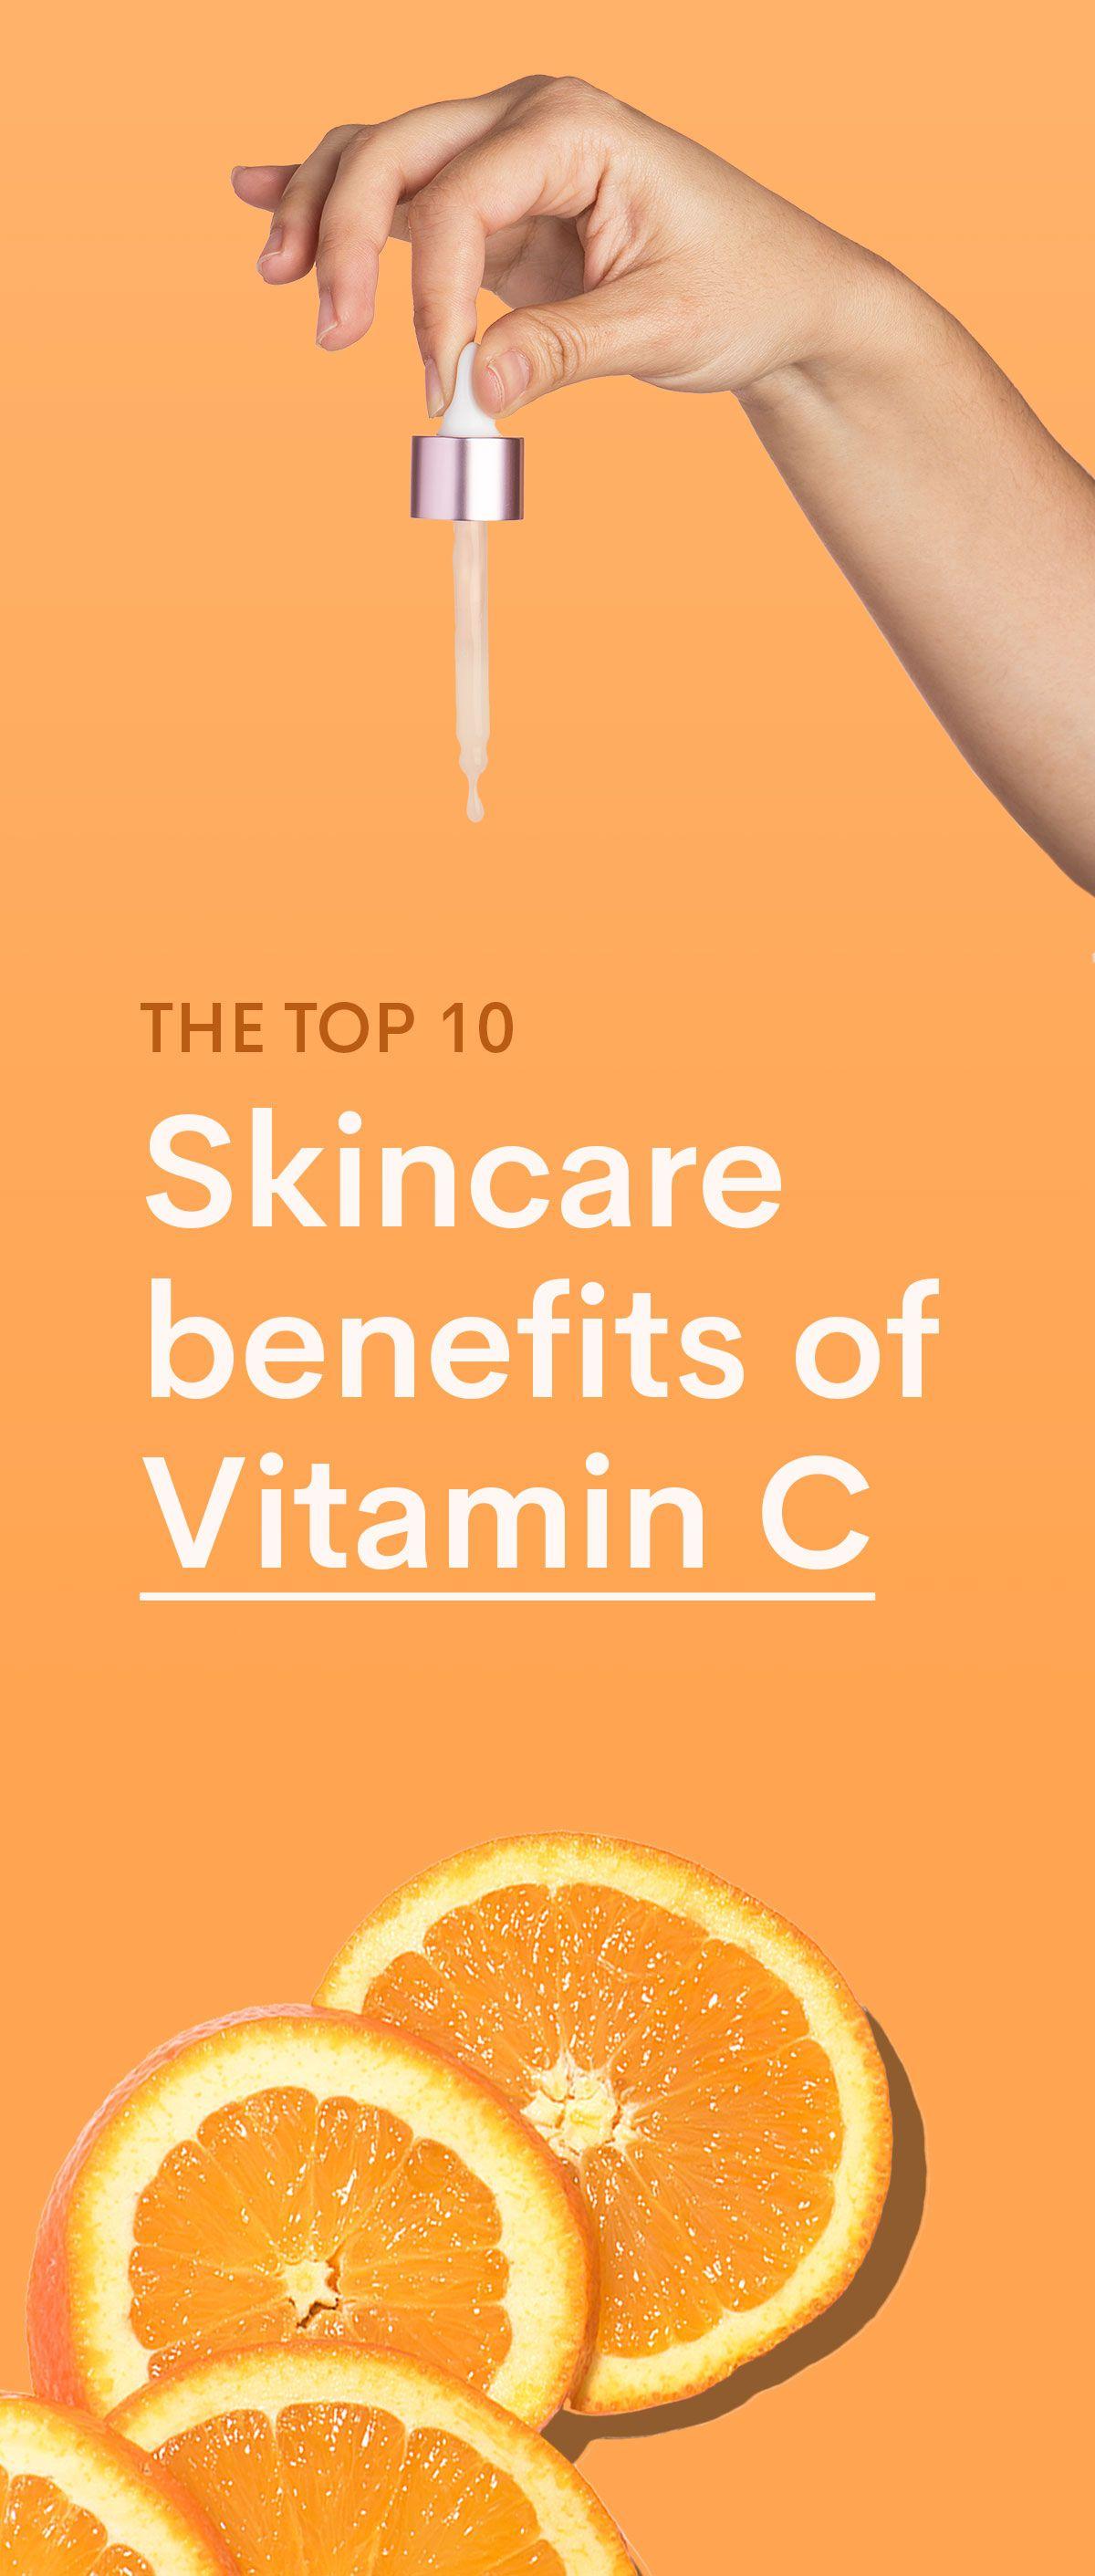 Vitamin C Skin Benefits Why This Ingredient Can Help Your Skin Skin Benefits Vitamin C Benefits Skin Care Benefits